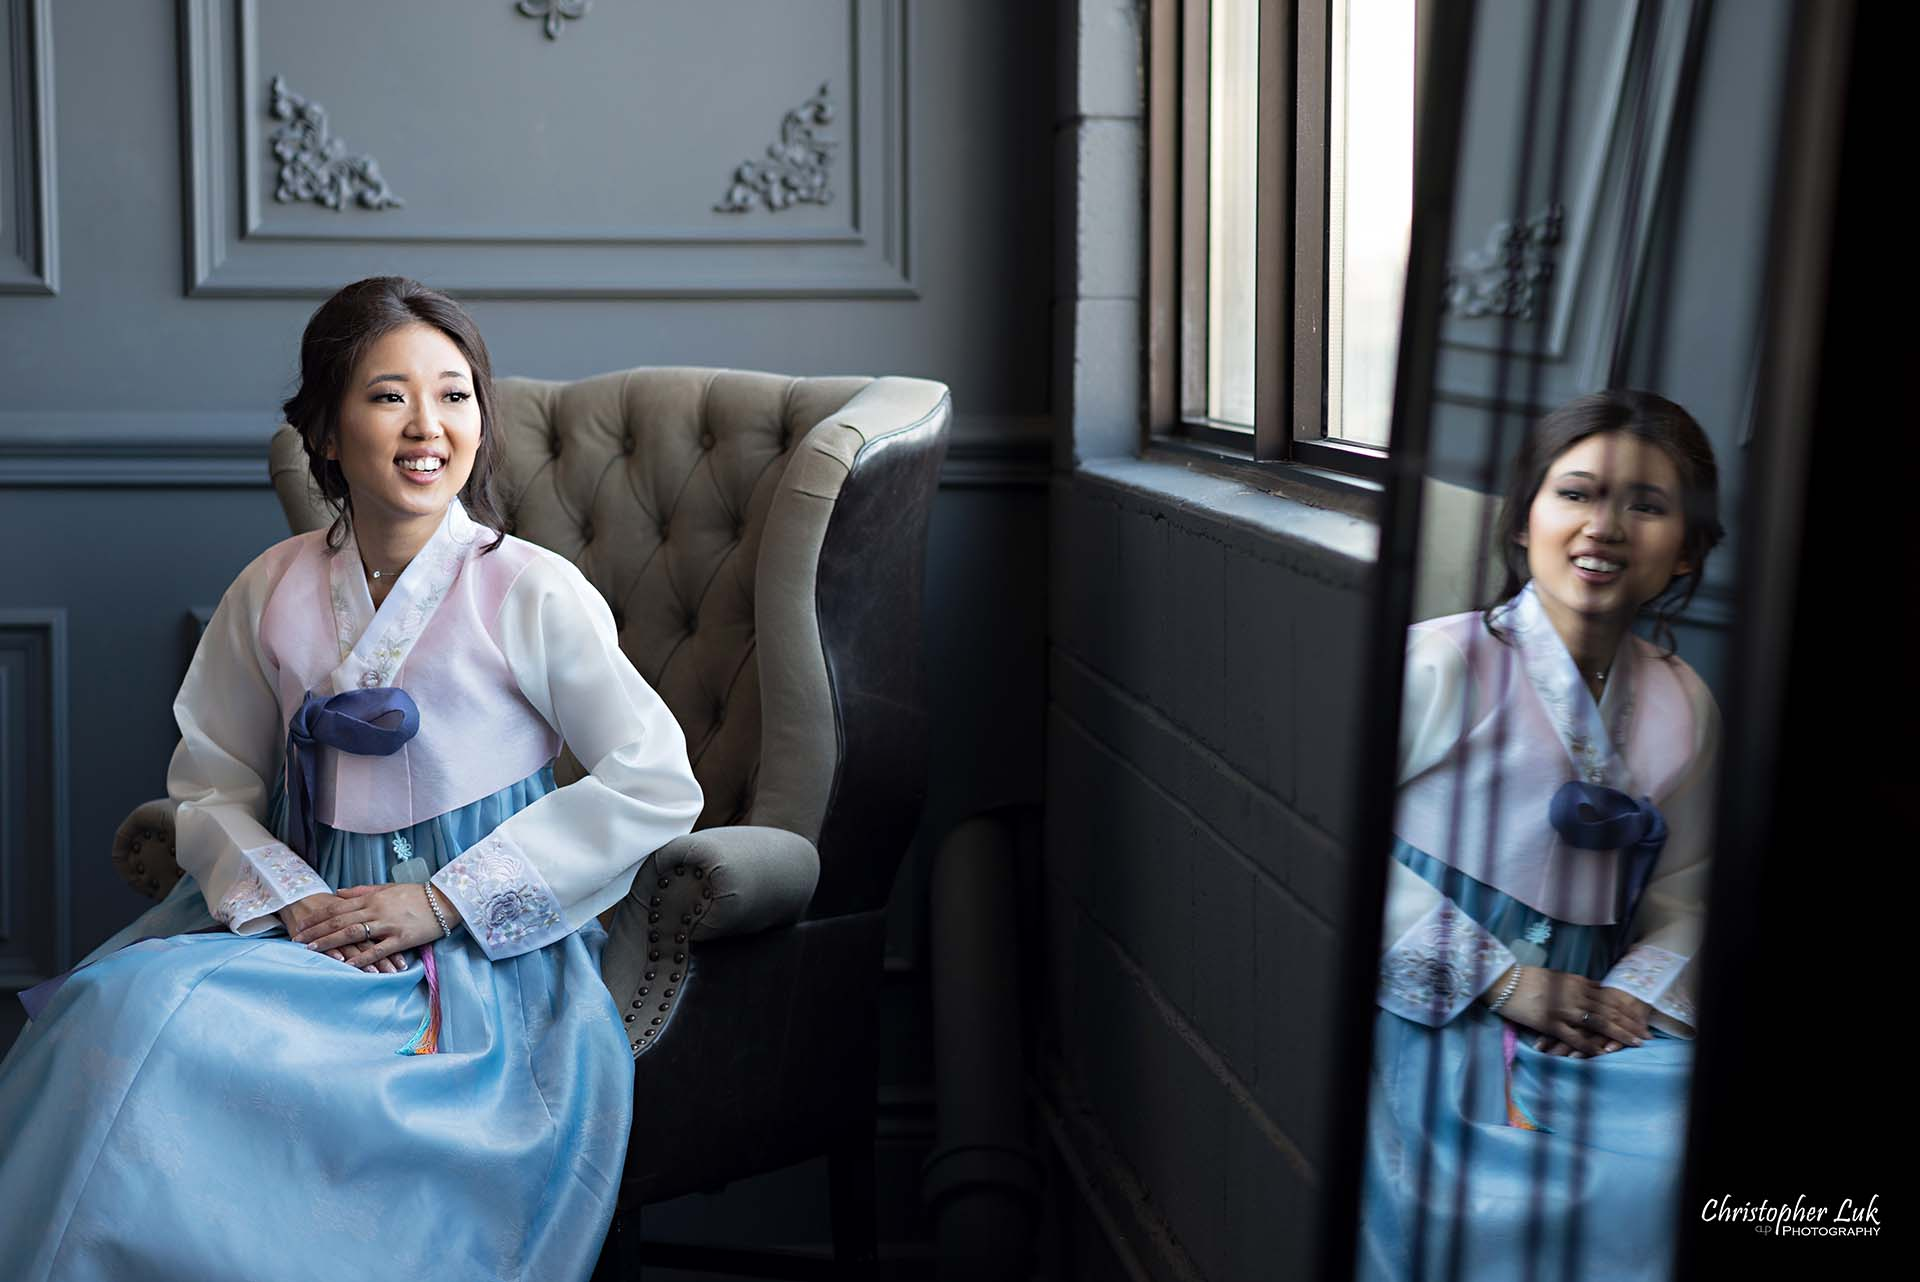 Christopher Luk Toronto Wedding Photographer - Mint Room Studios Bride Natural Candid Photojournalistic Library Studio Korean Drama Hanbok Leather Wingback Chair Mirror